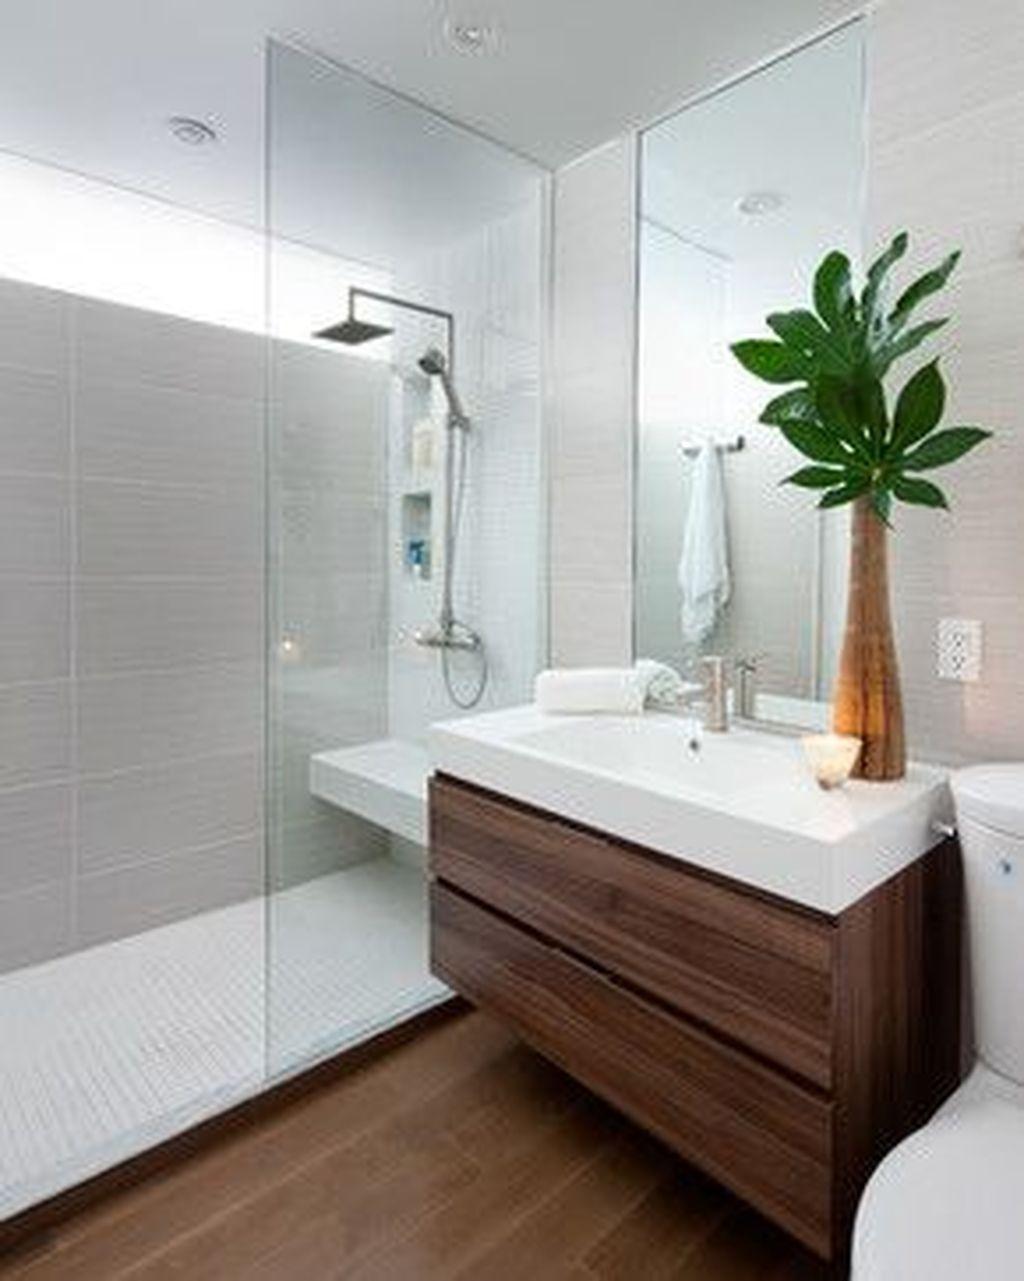 39 Cool And Stylish Small Bathroom Design Ideas15